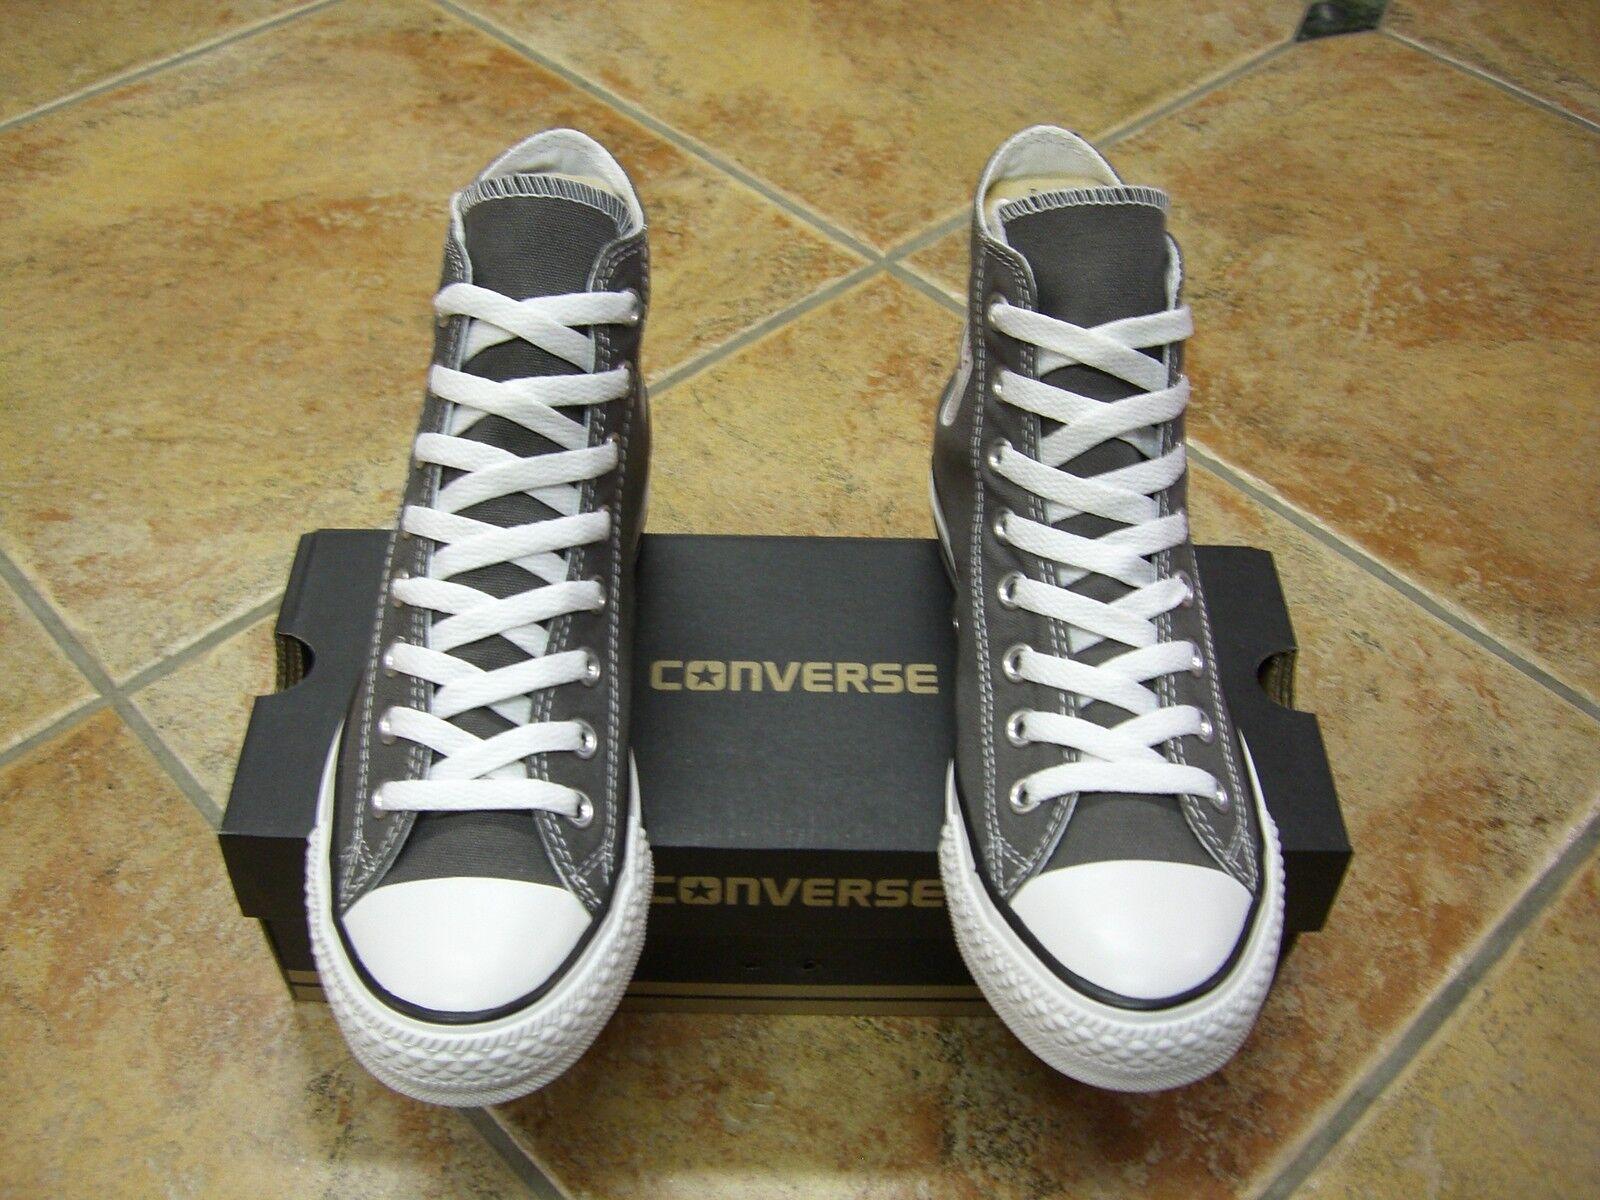 Converse Chucks All Star HI Größe 48 Charcoal 1J793C Neu Sneaker